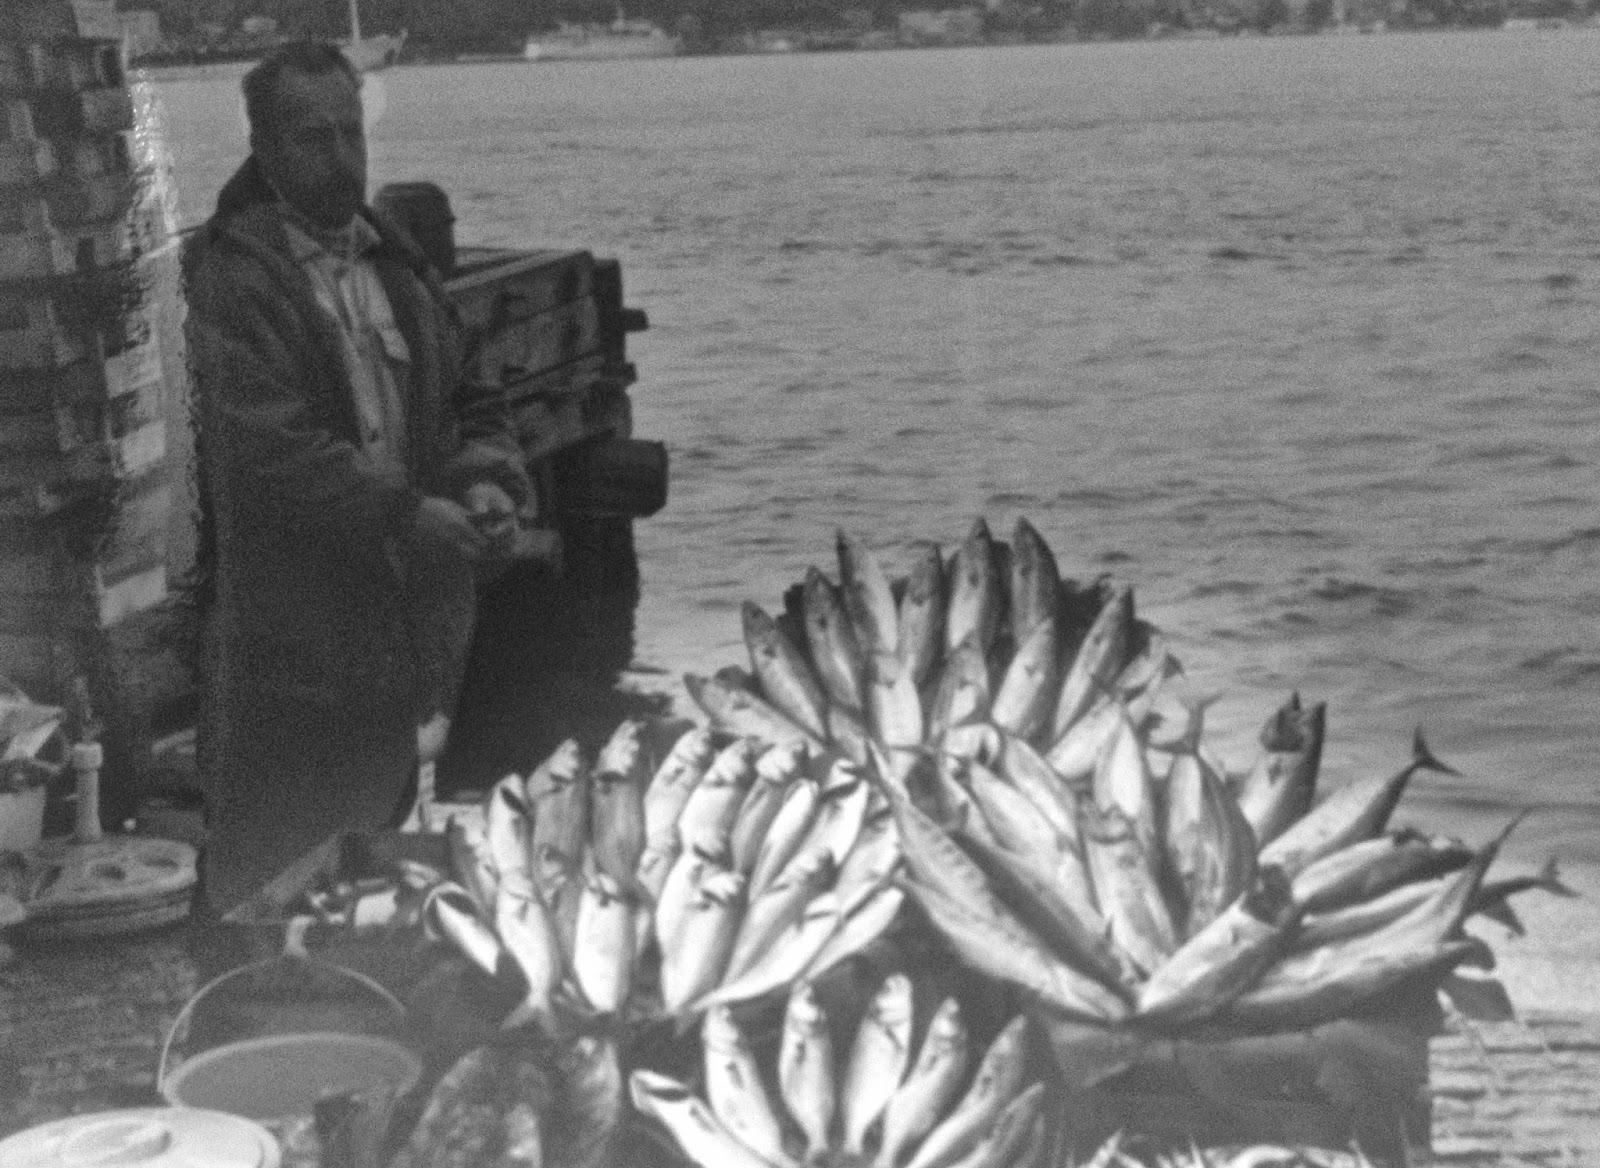 fishmonger Istanbul: simplelivingeating.com